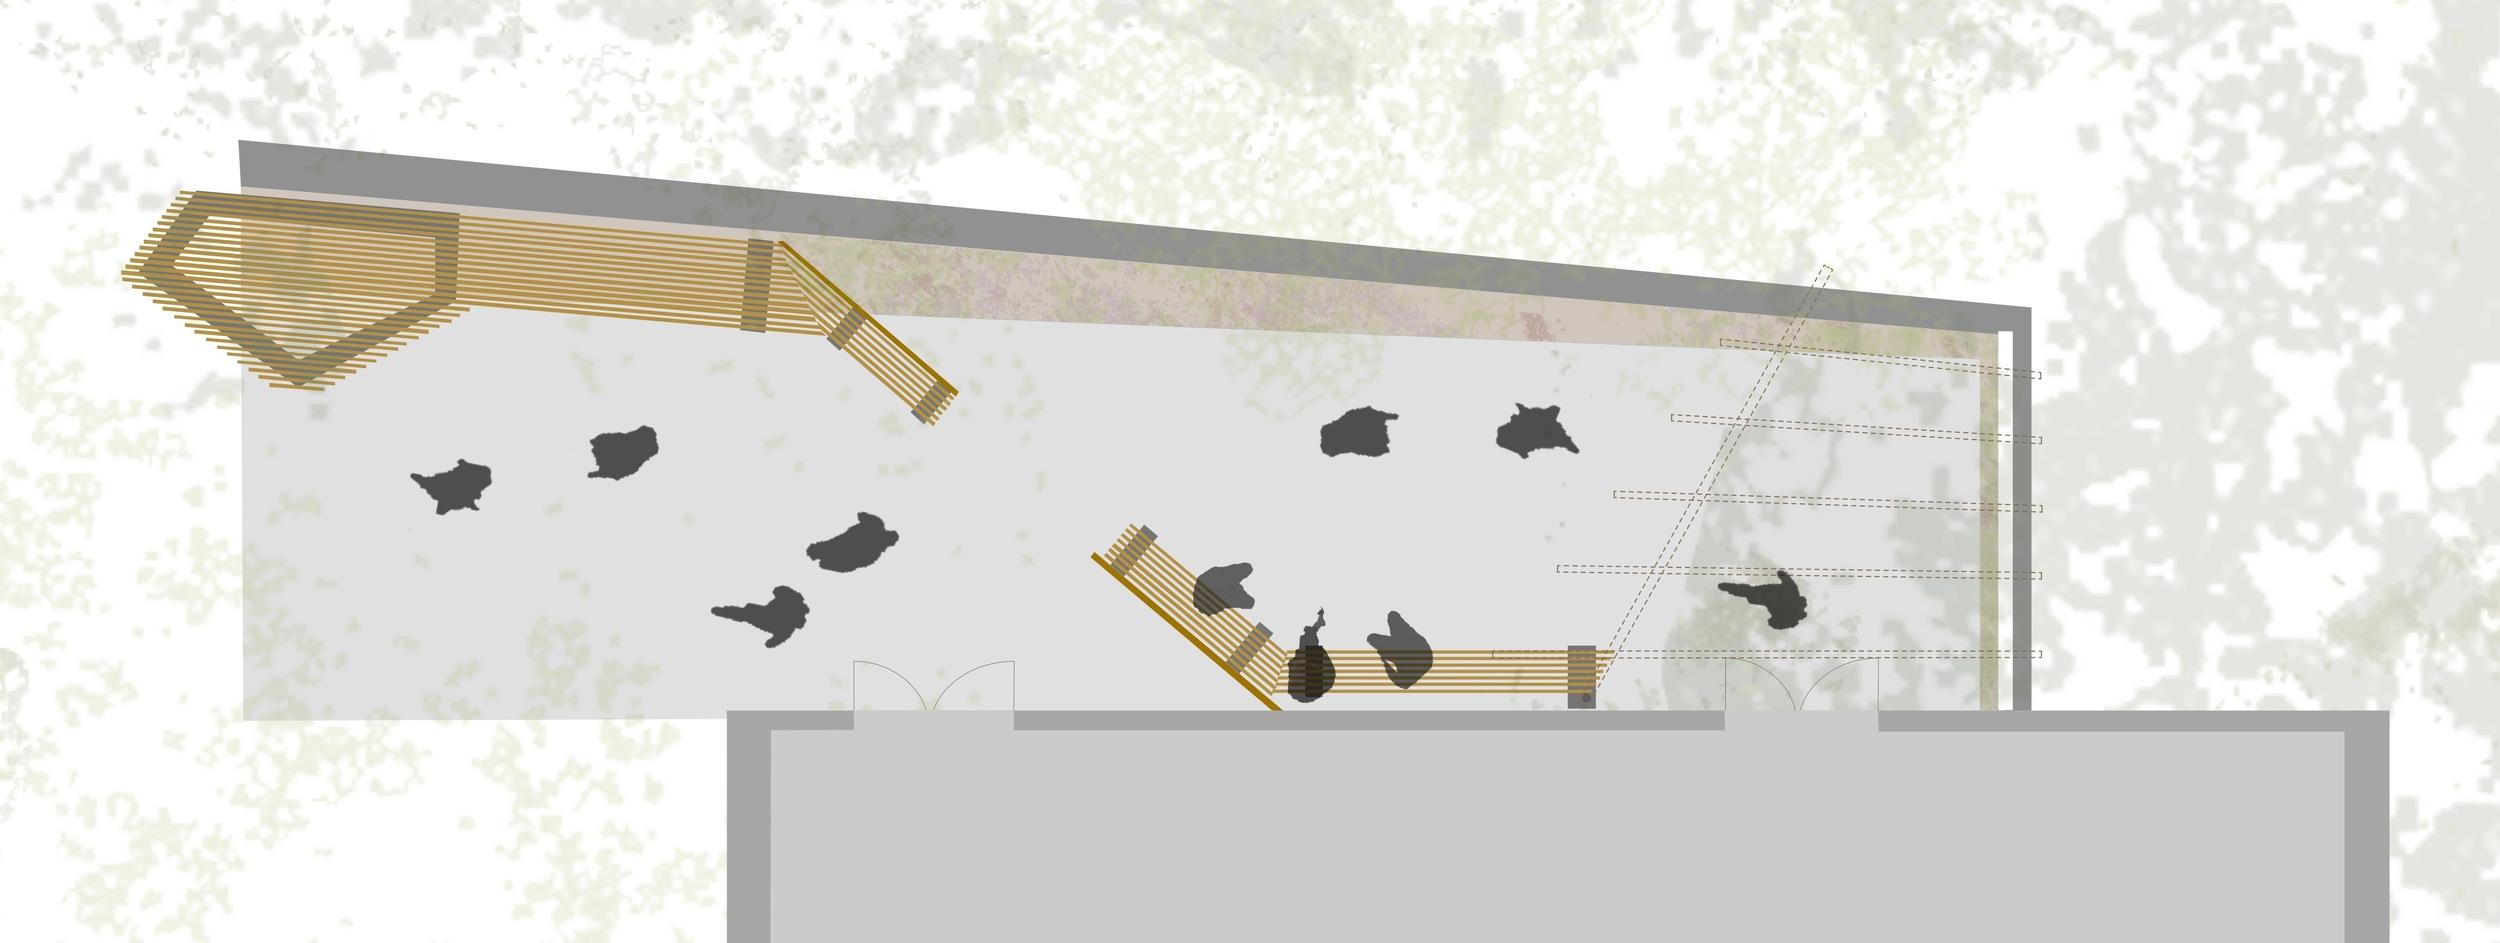 Living Courtyard, final plan drawing. May 2012.